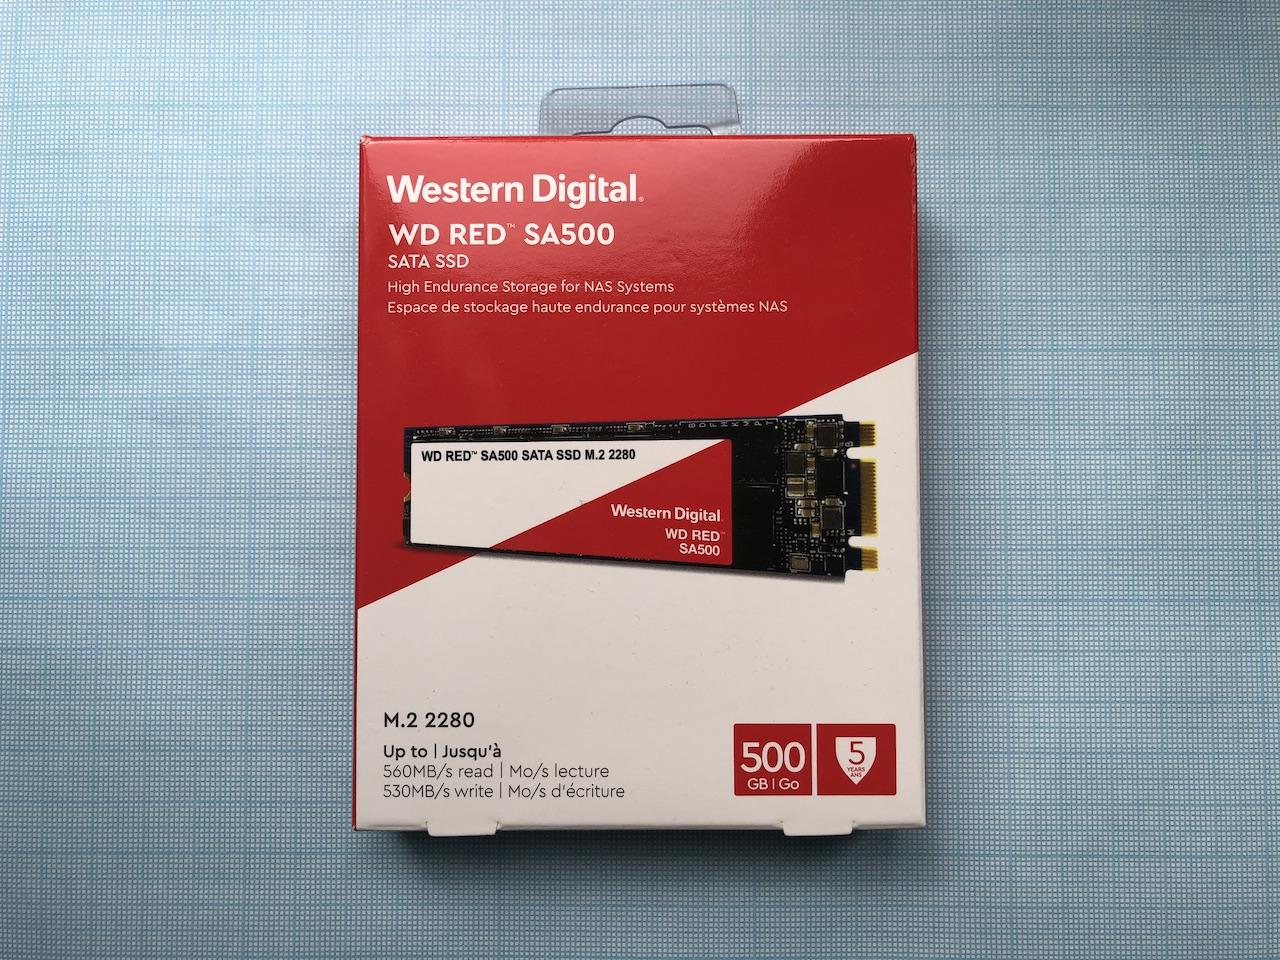 Обзор и тестирование WD Red SA500 500GB (WDS500G1R0B)